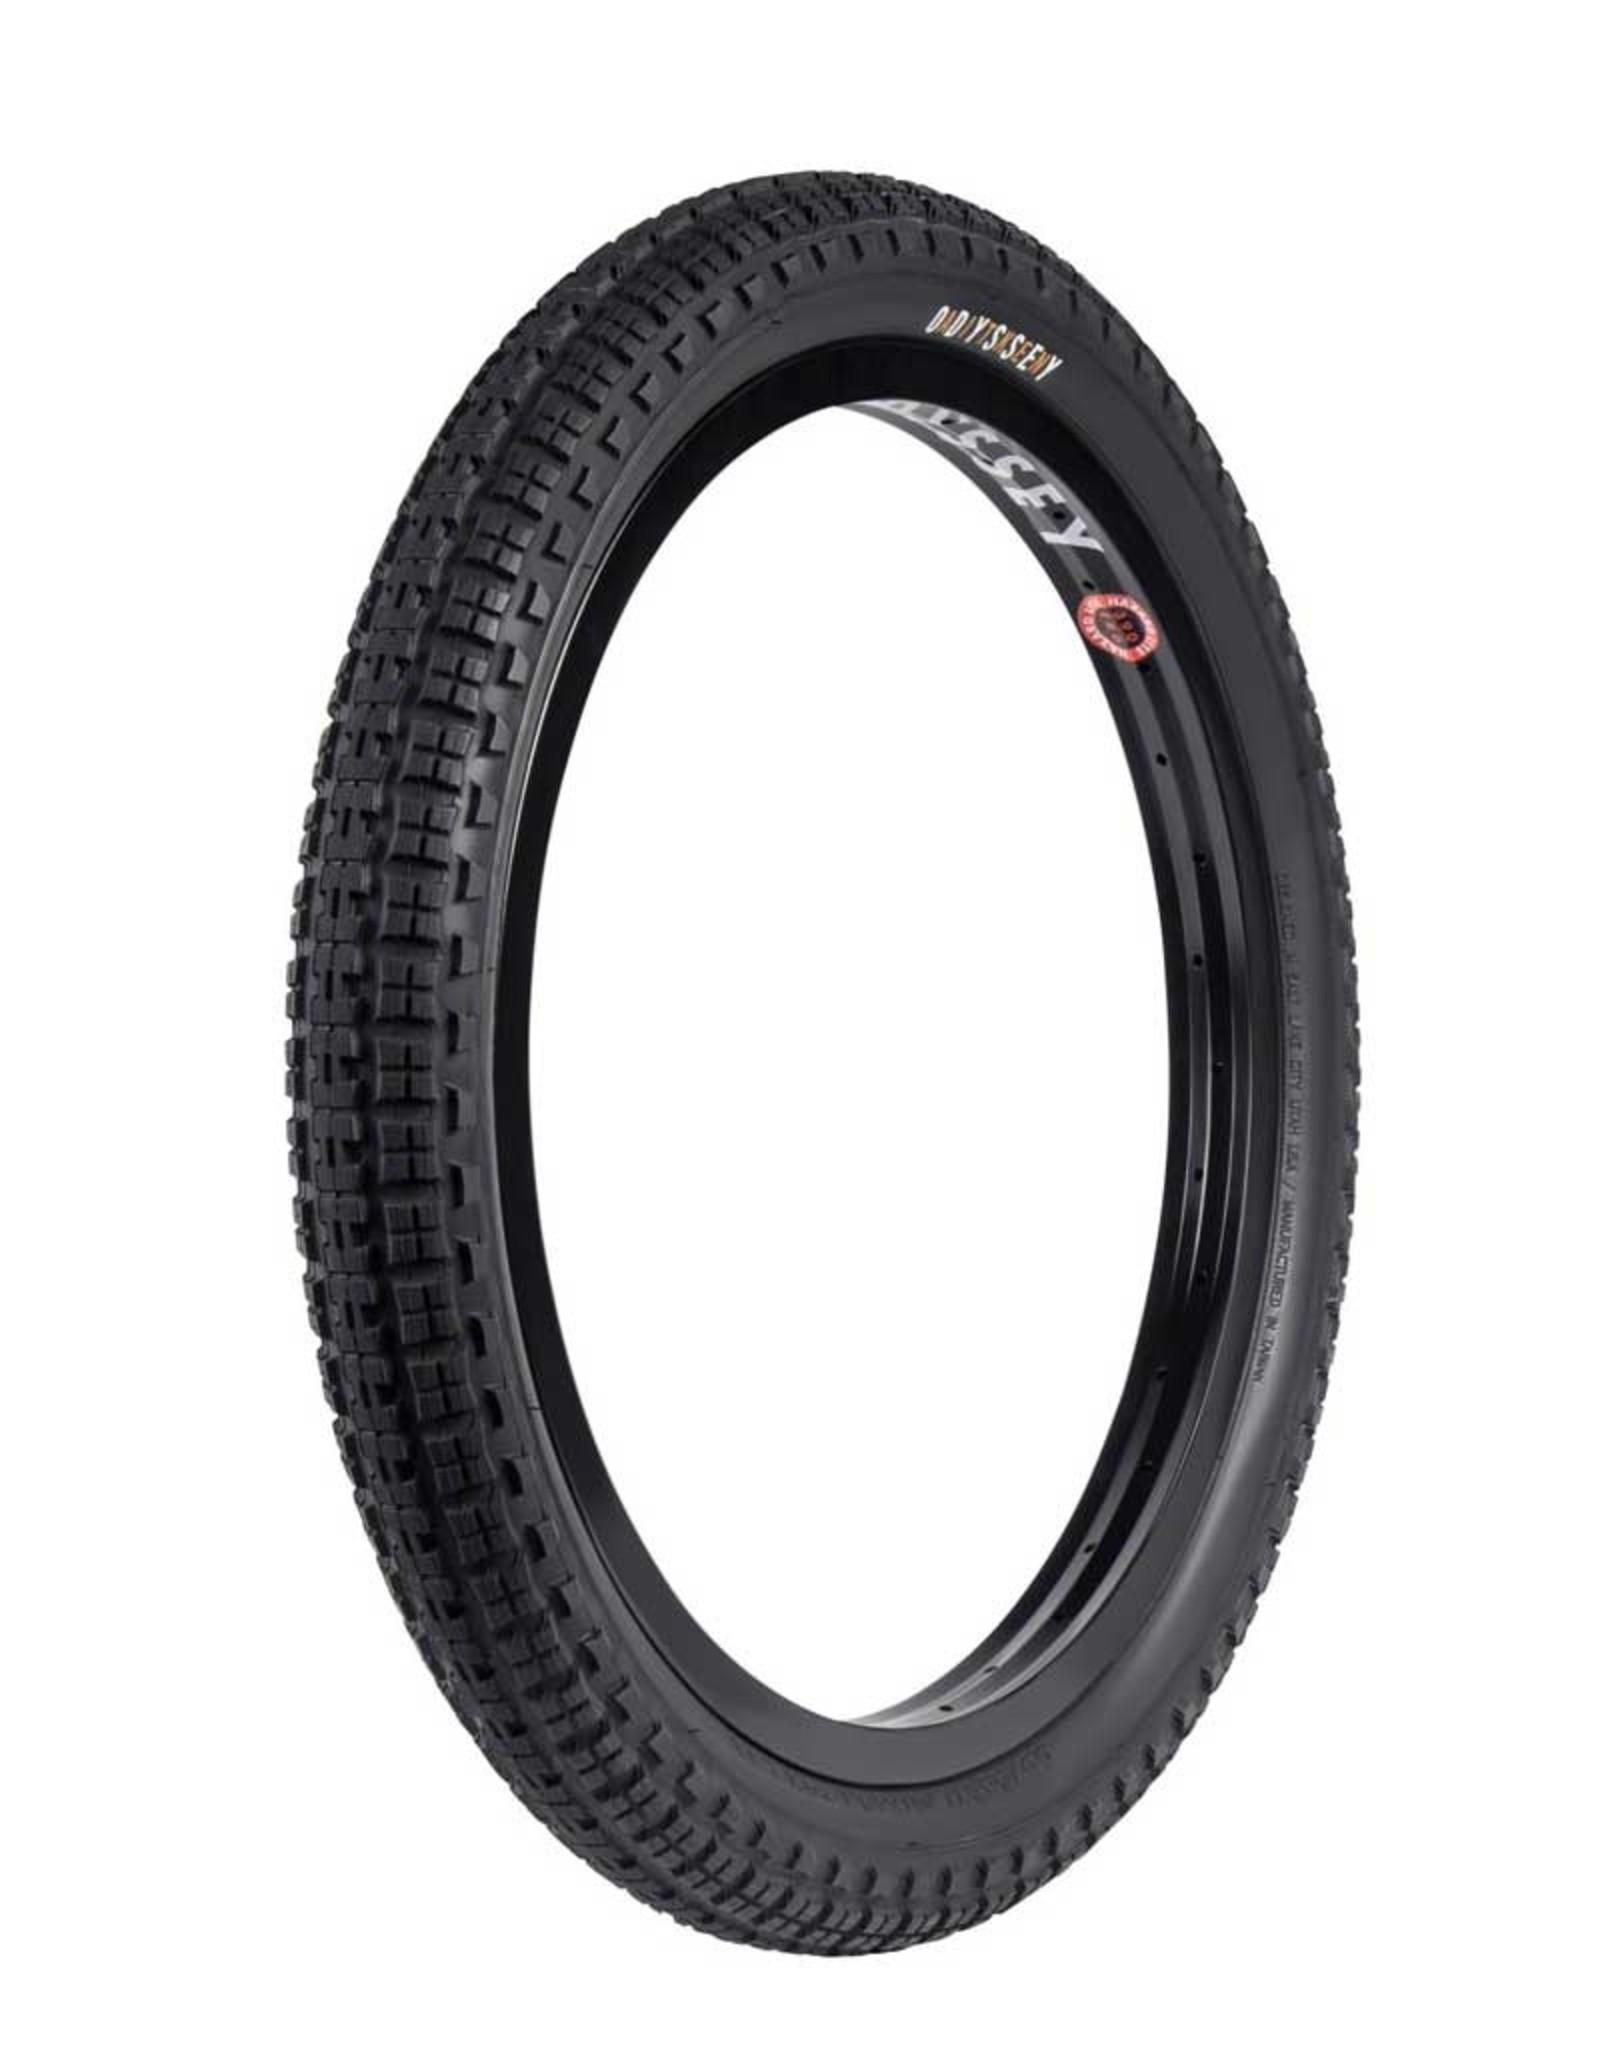 Odyssey Odyssey Aitken Tire 20x 2.35 Knobby Black